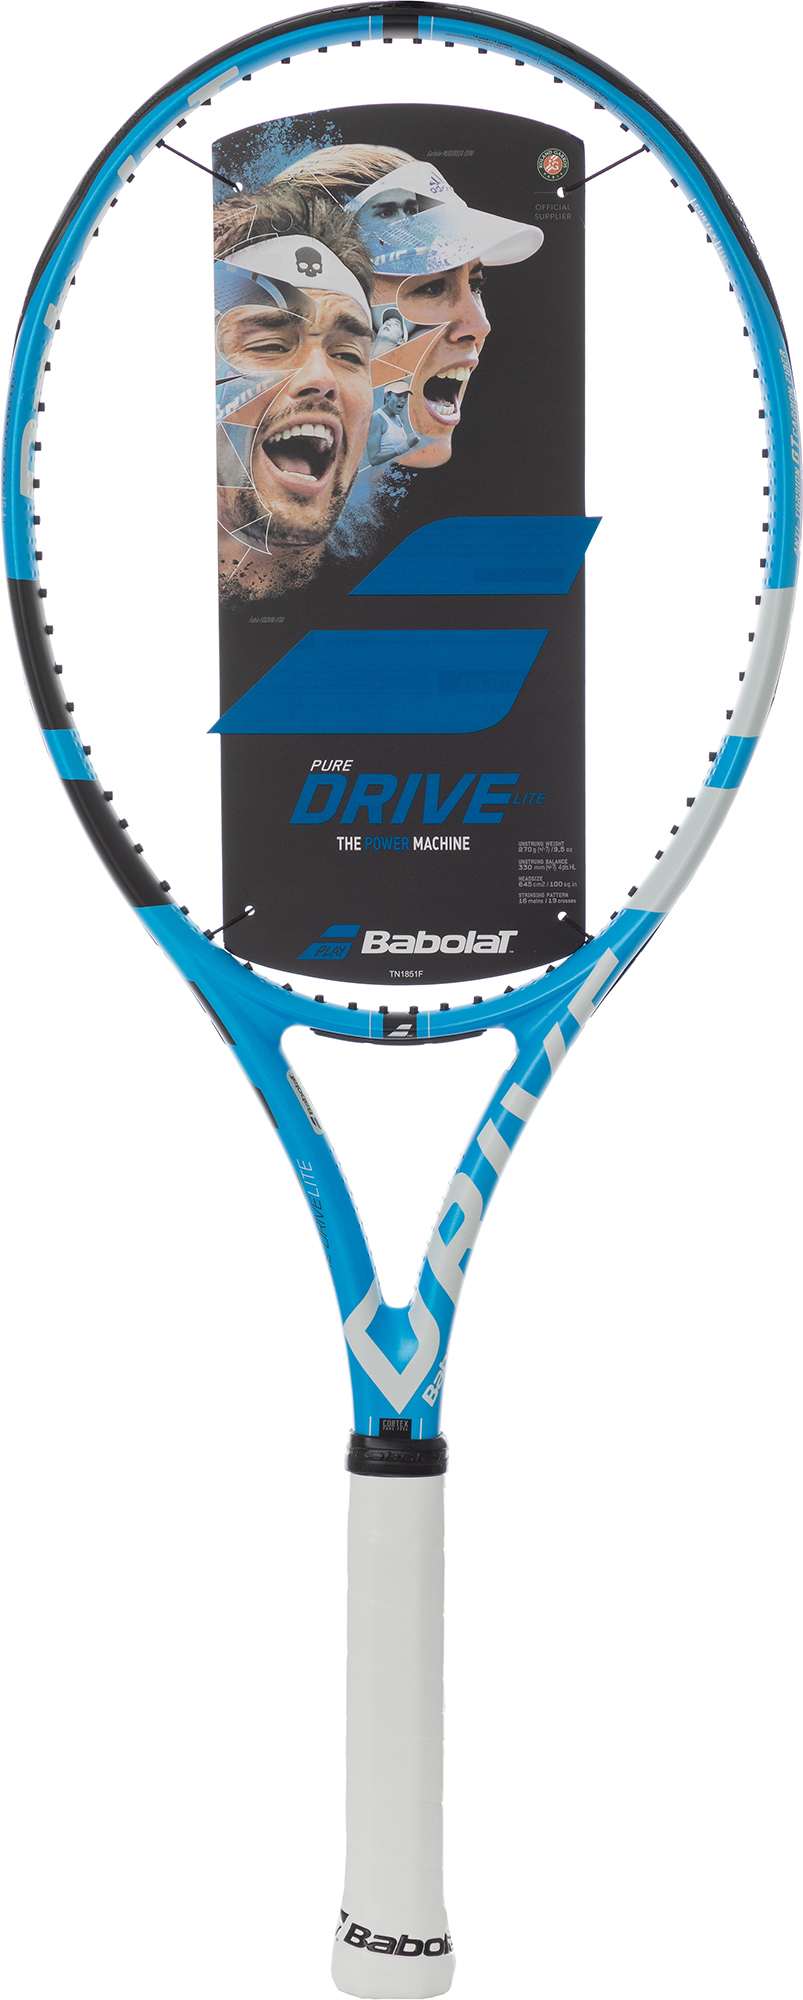 Babolat Ракетка для большого тенниса Babolat Pure Drive Lite babolat ракетка для большого тенниса babolat pure strike team размер 3